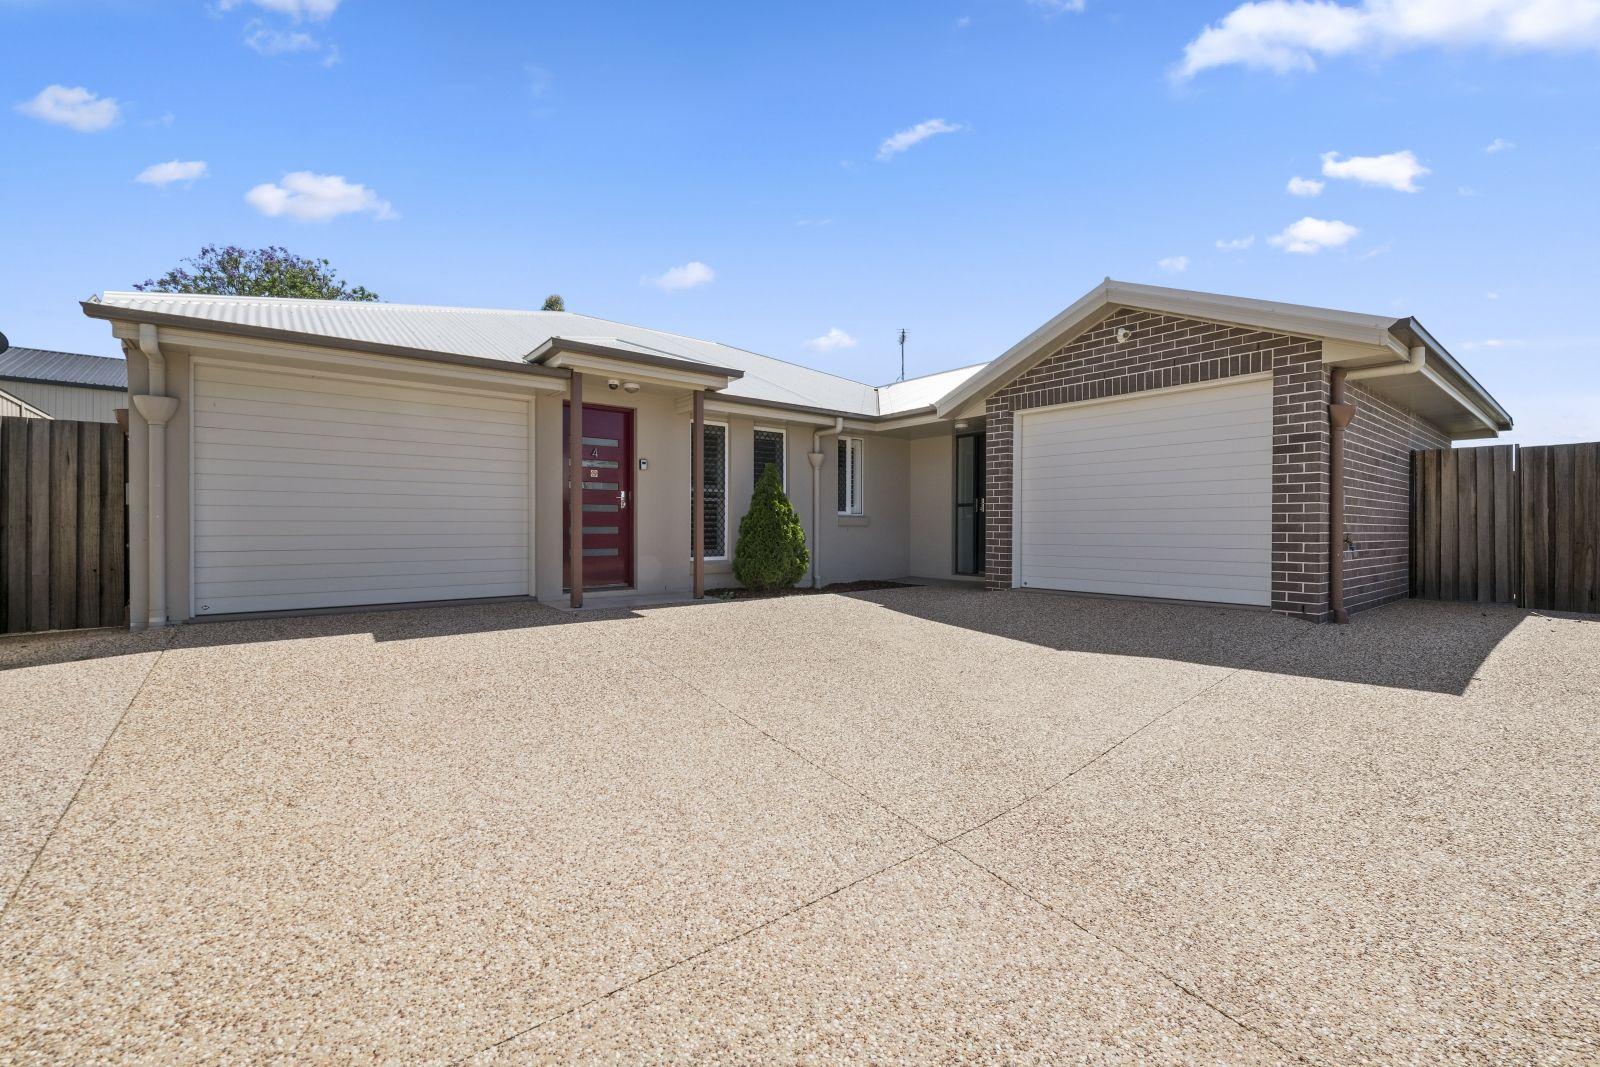 4/7 Gostwyck Street, Newtown QLD 4350, Image 0